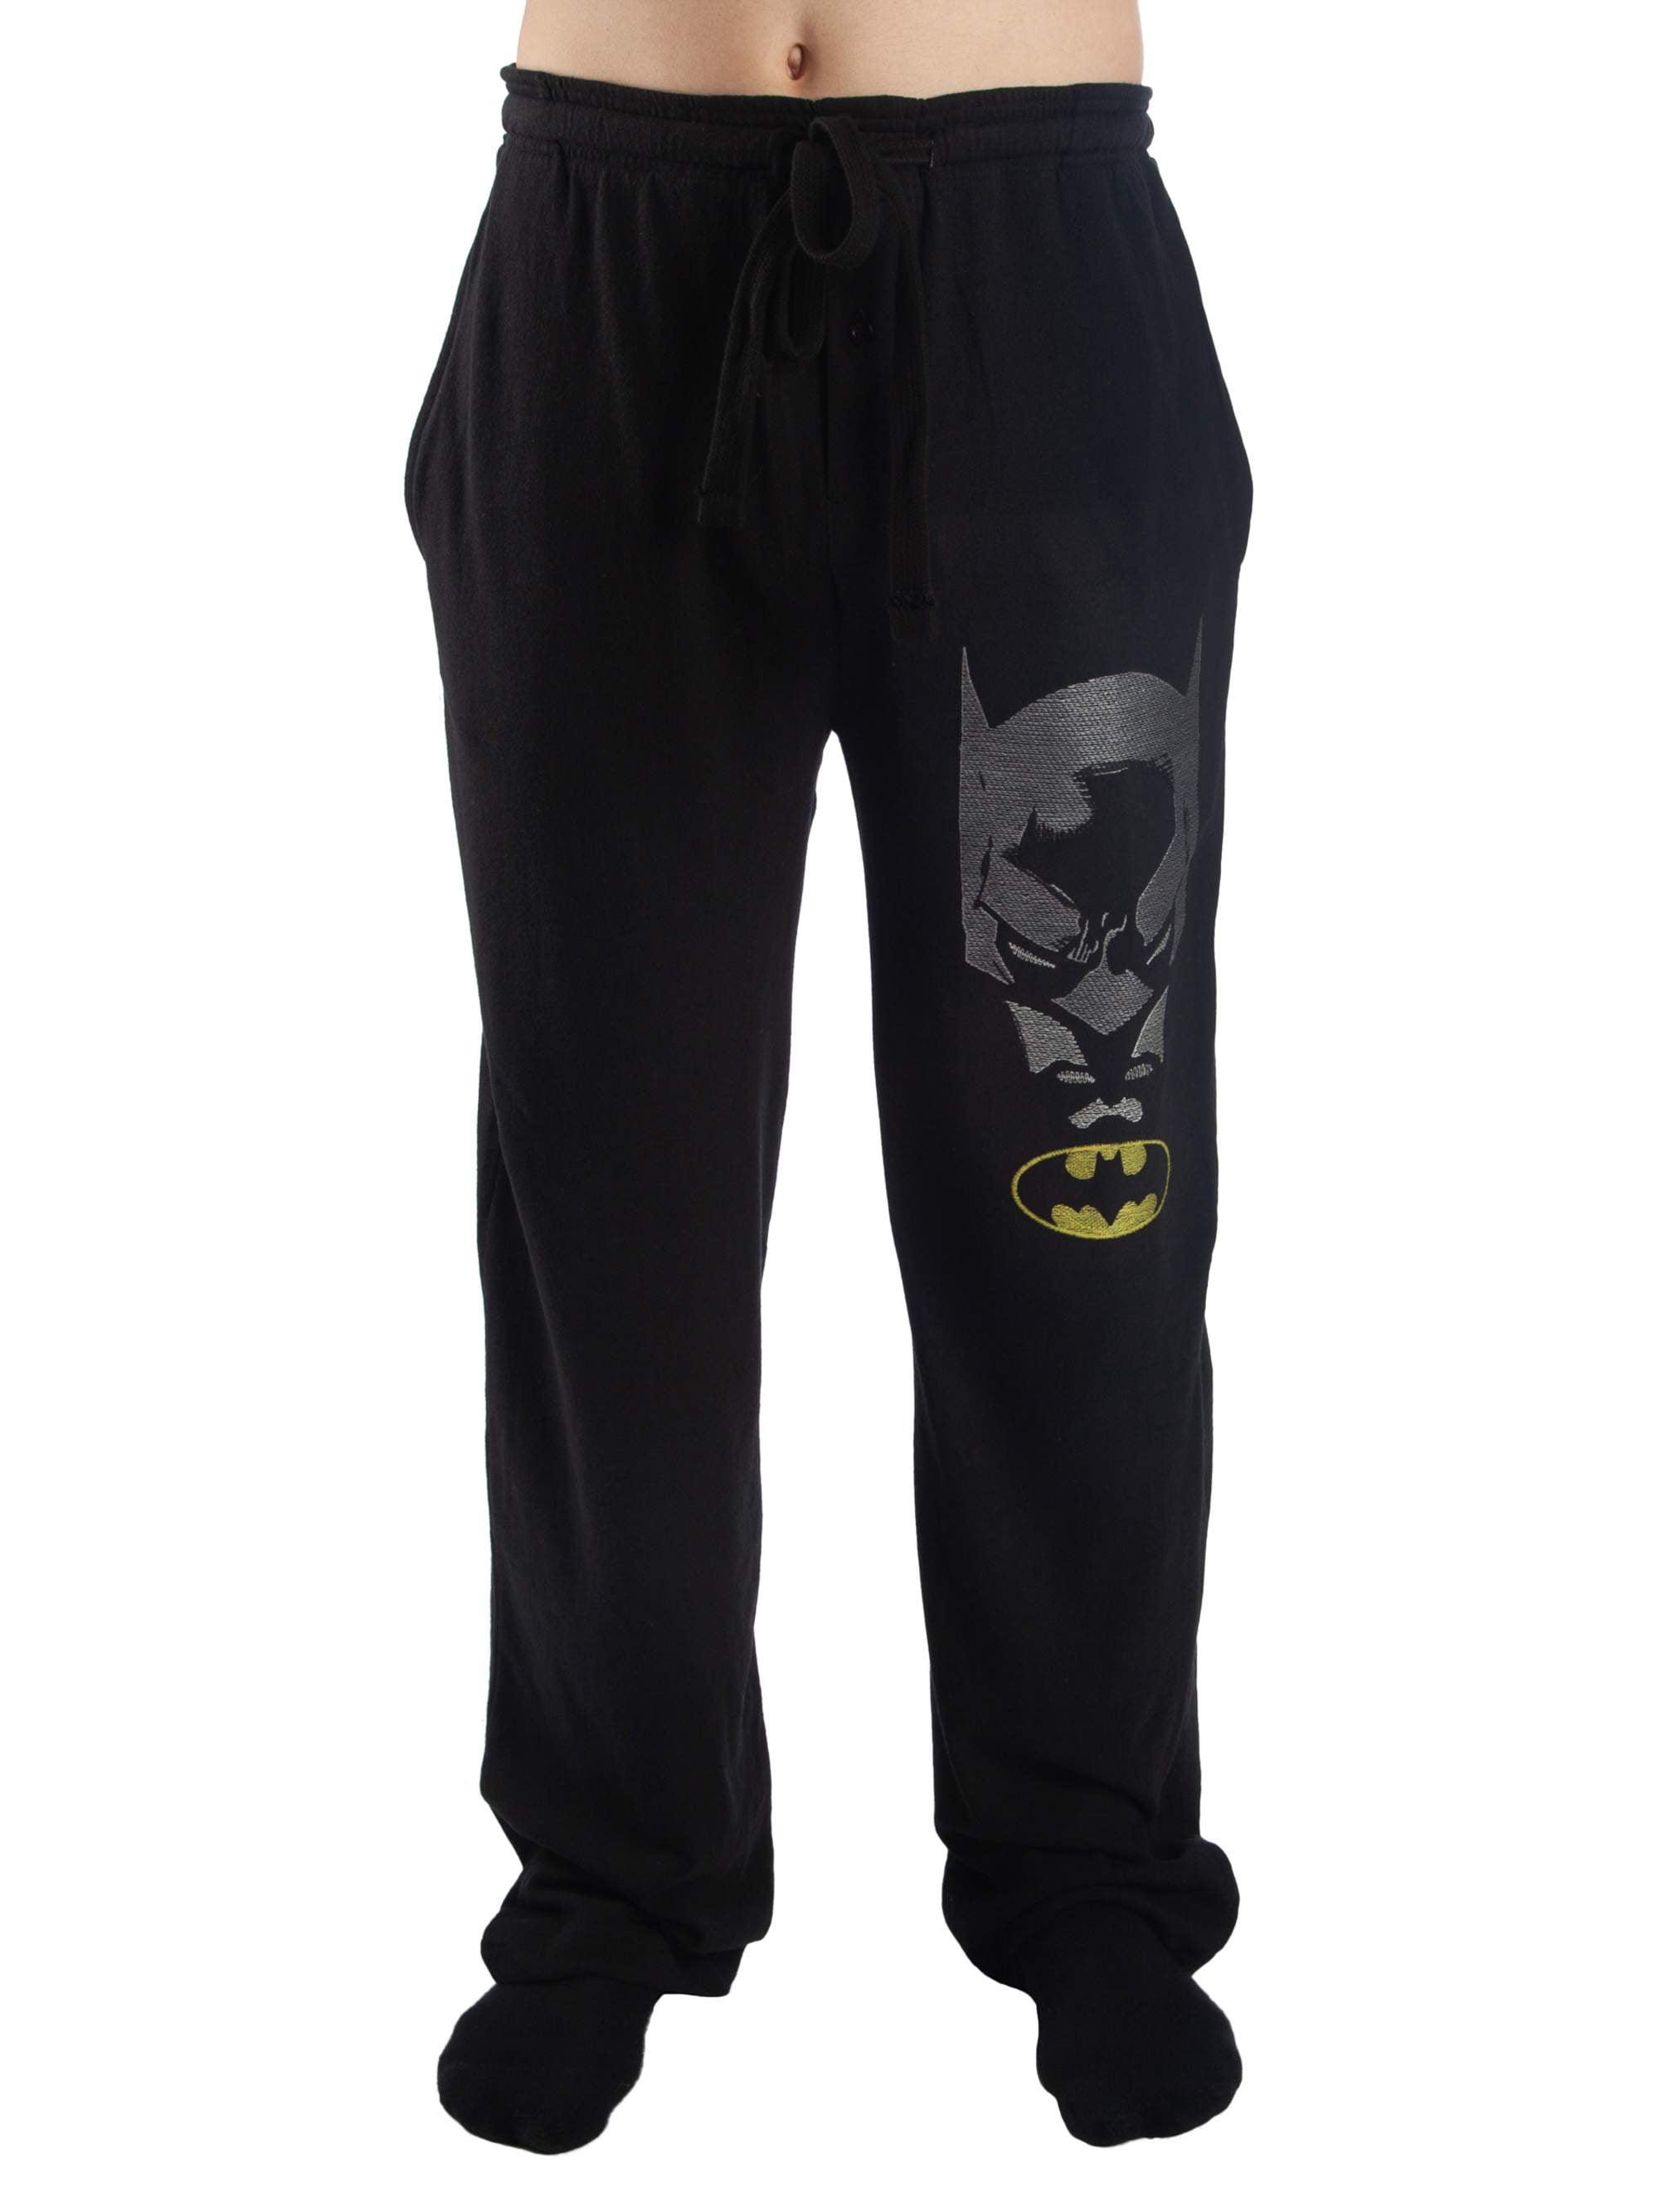 Men's Batman Printed Embroidery Pajama Lounge Pants